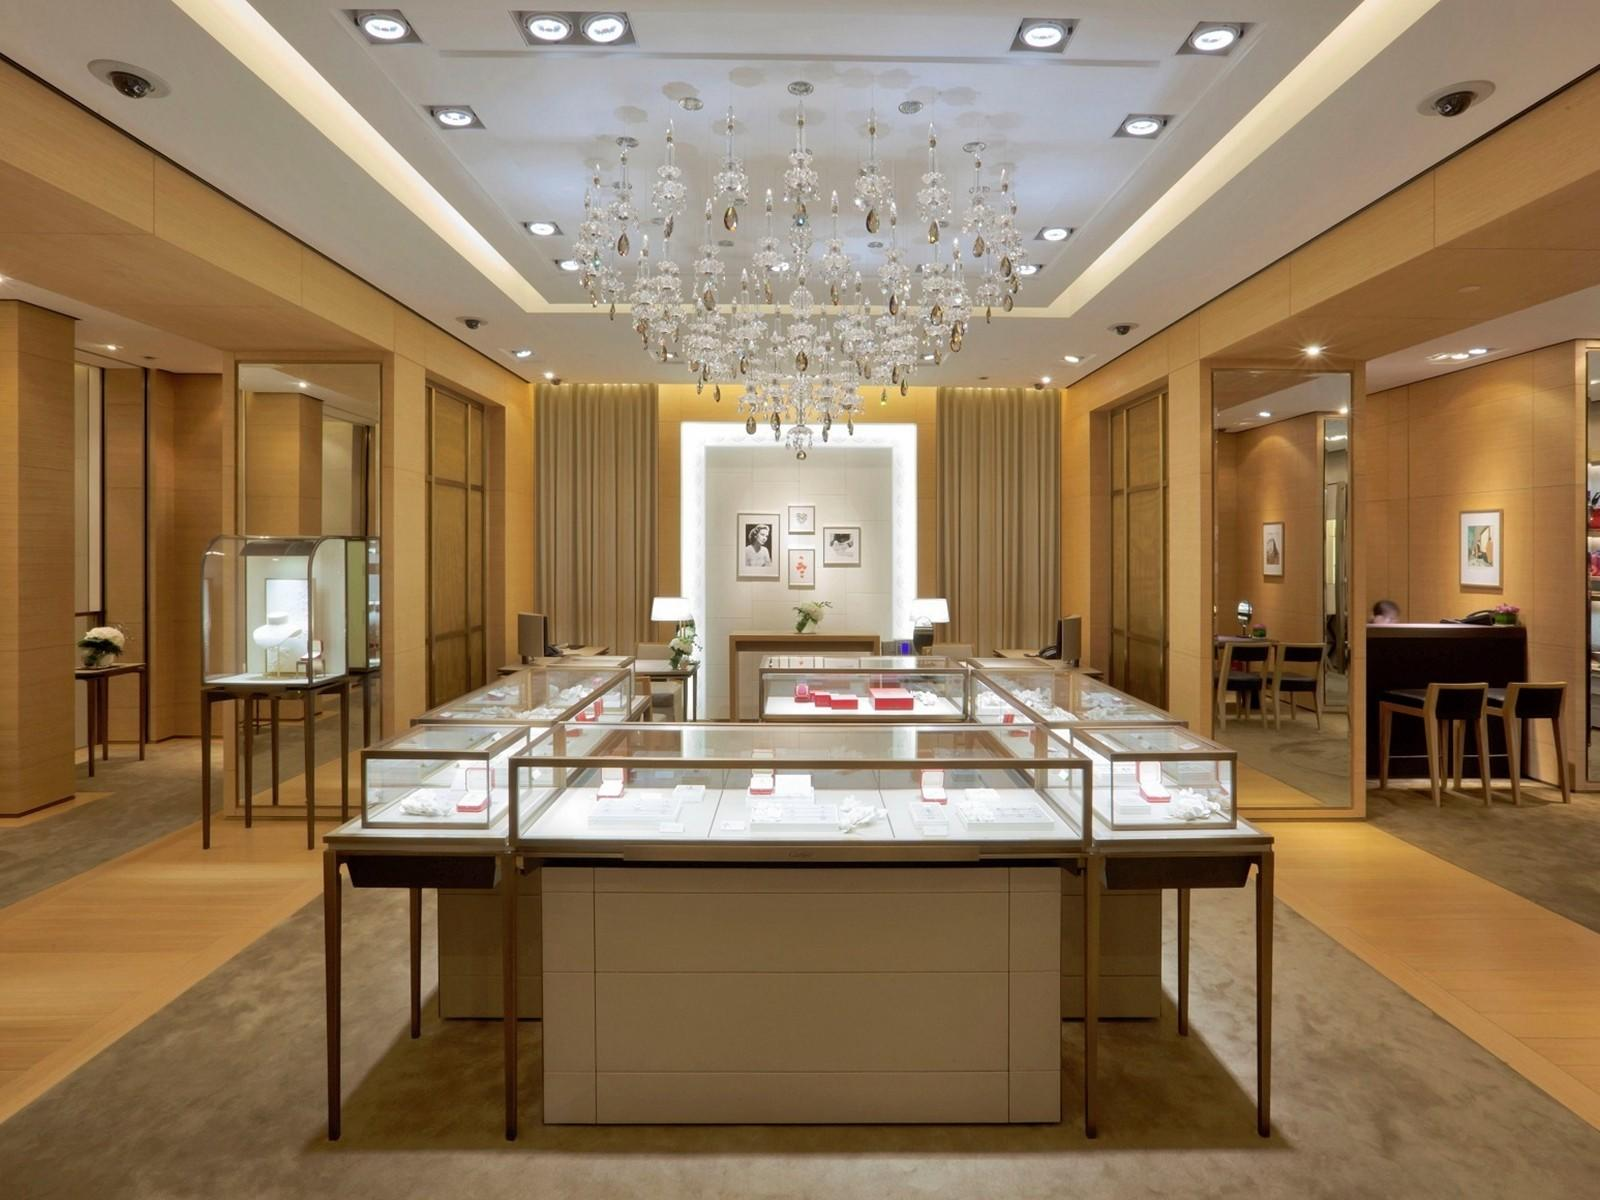 custom jewellery display cabinets OEM for shop OUYEE-1